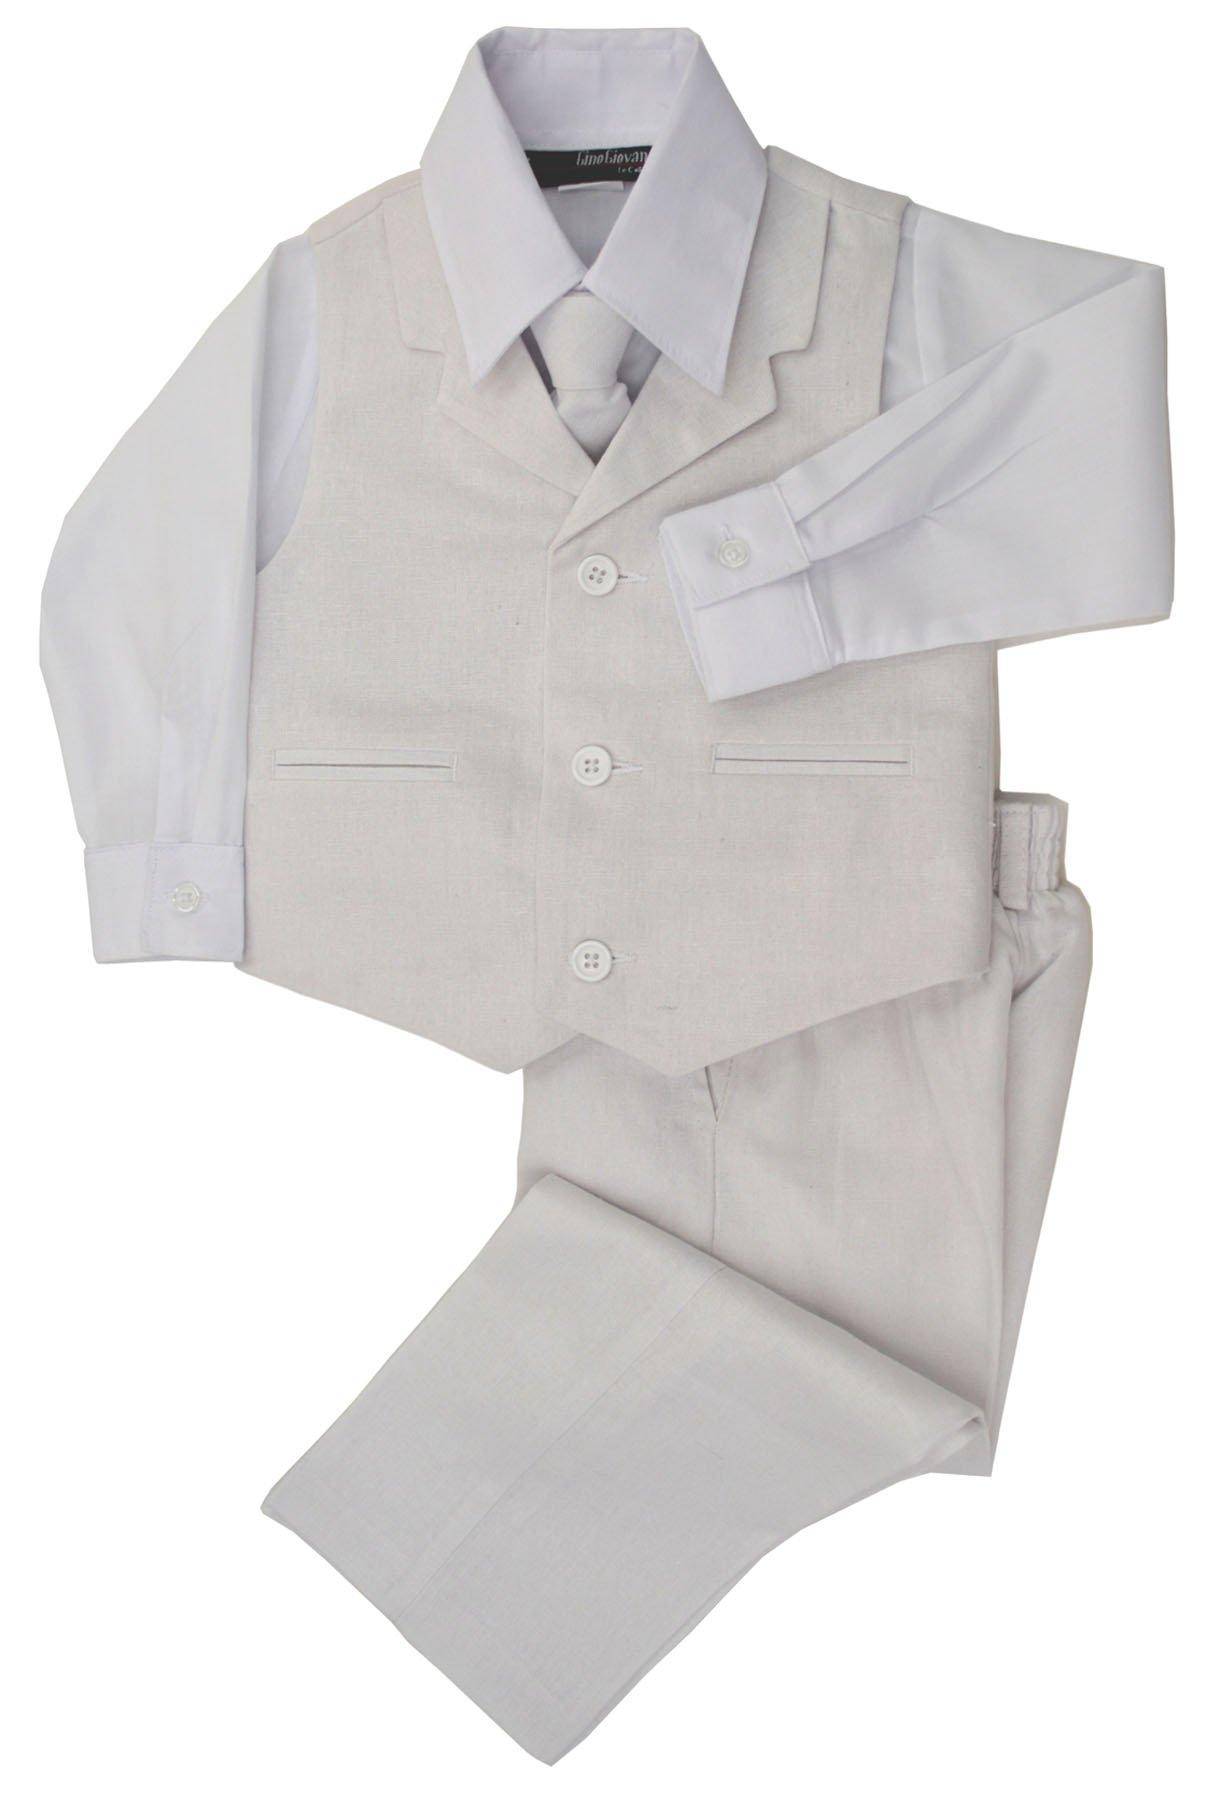 Little Boys Summer Linen Blend Suit Vest Dresswear Set G270 (7, White)